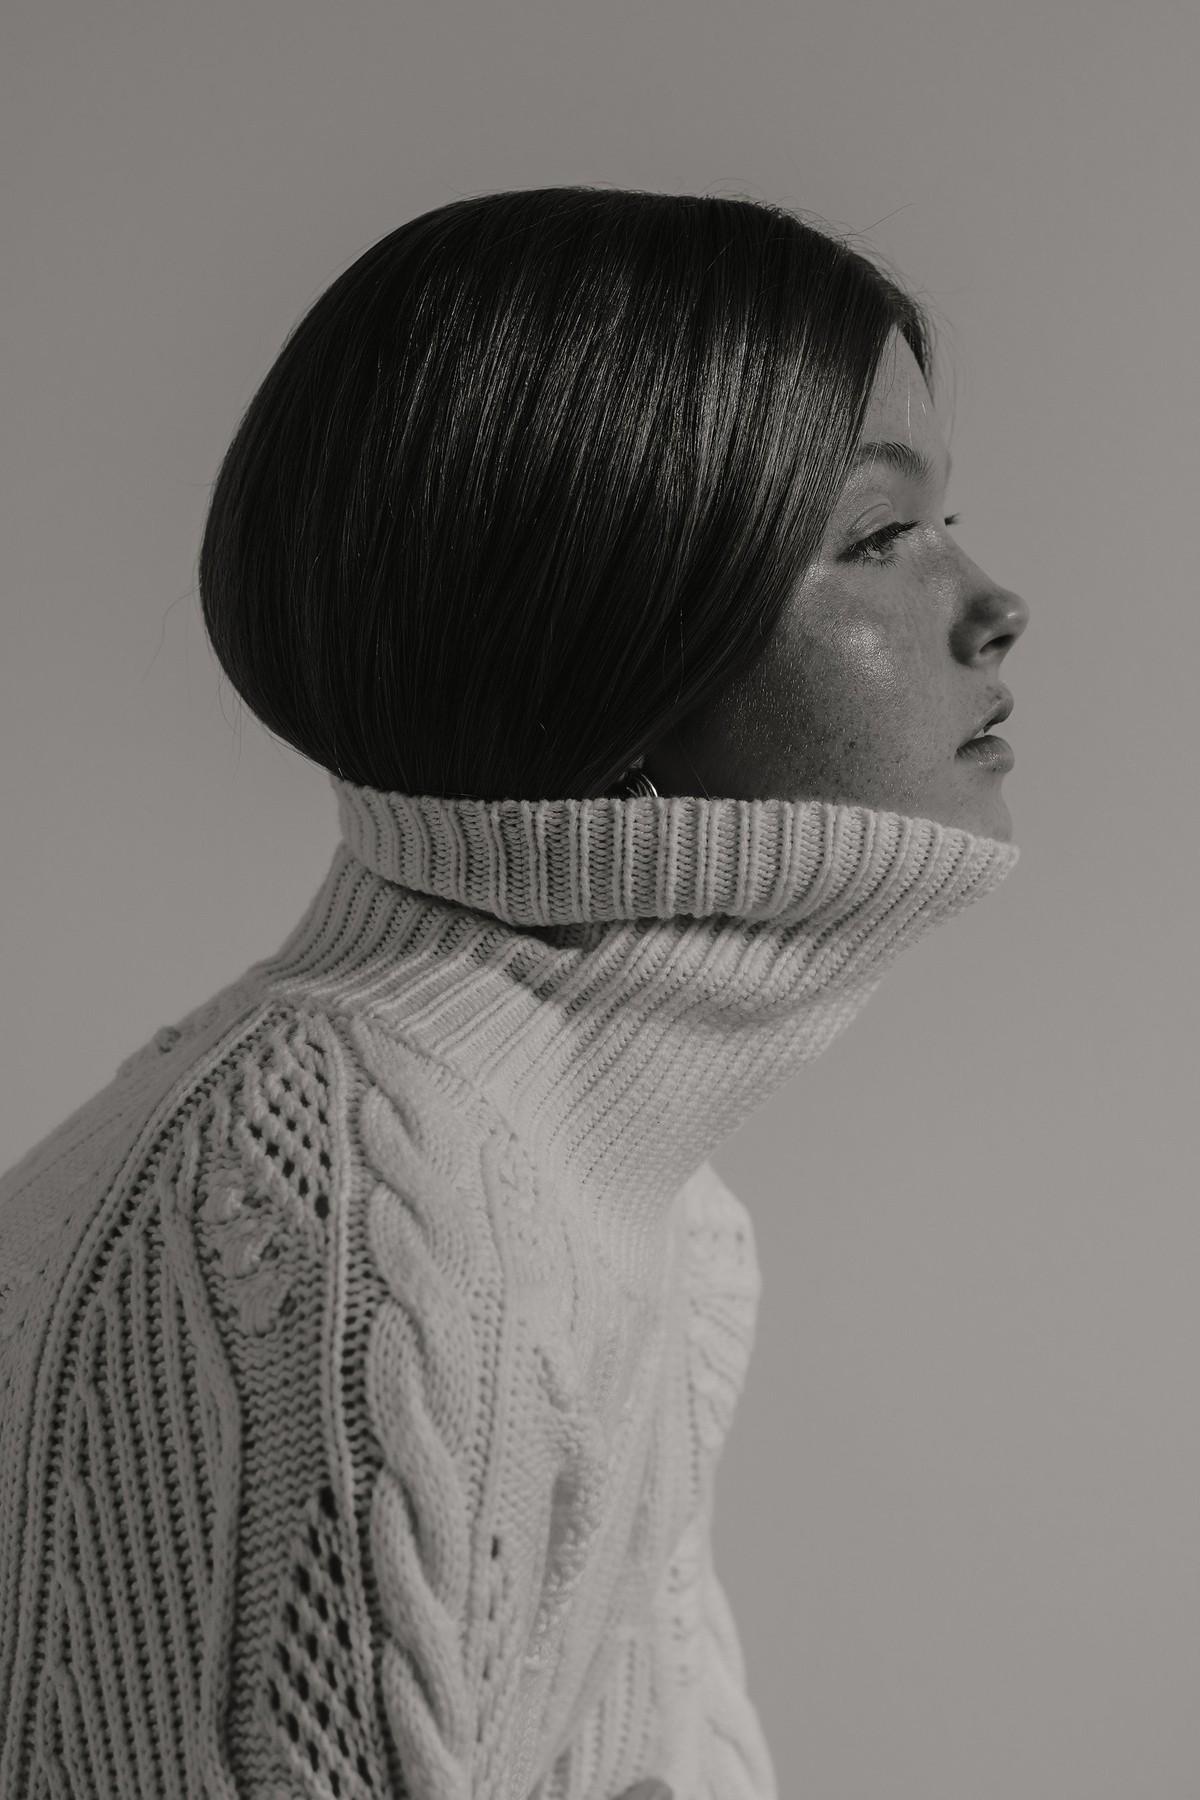 knitwear-slide-09b6-mobilemasterat3x.jpg